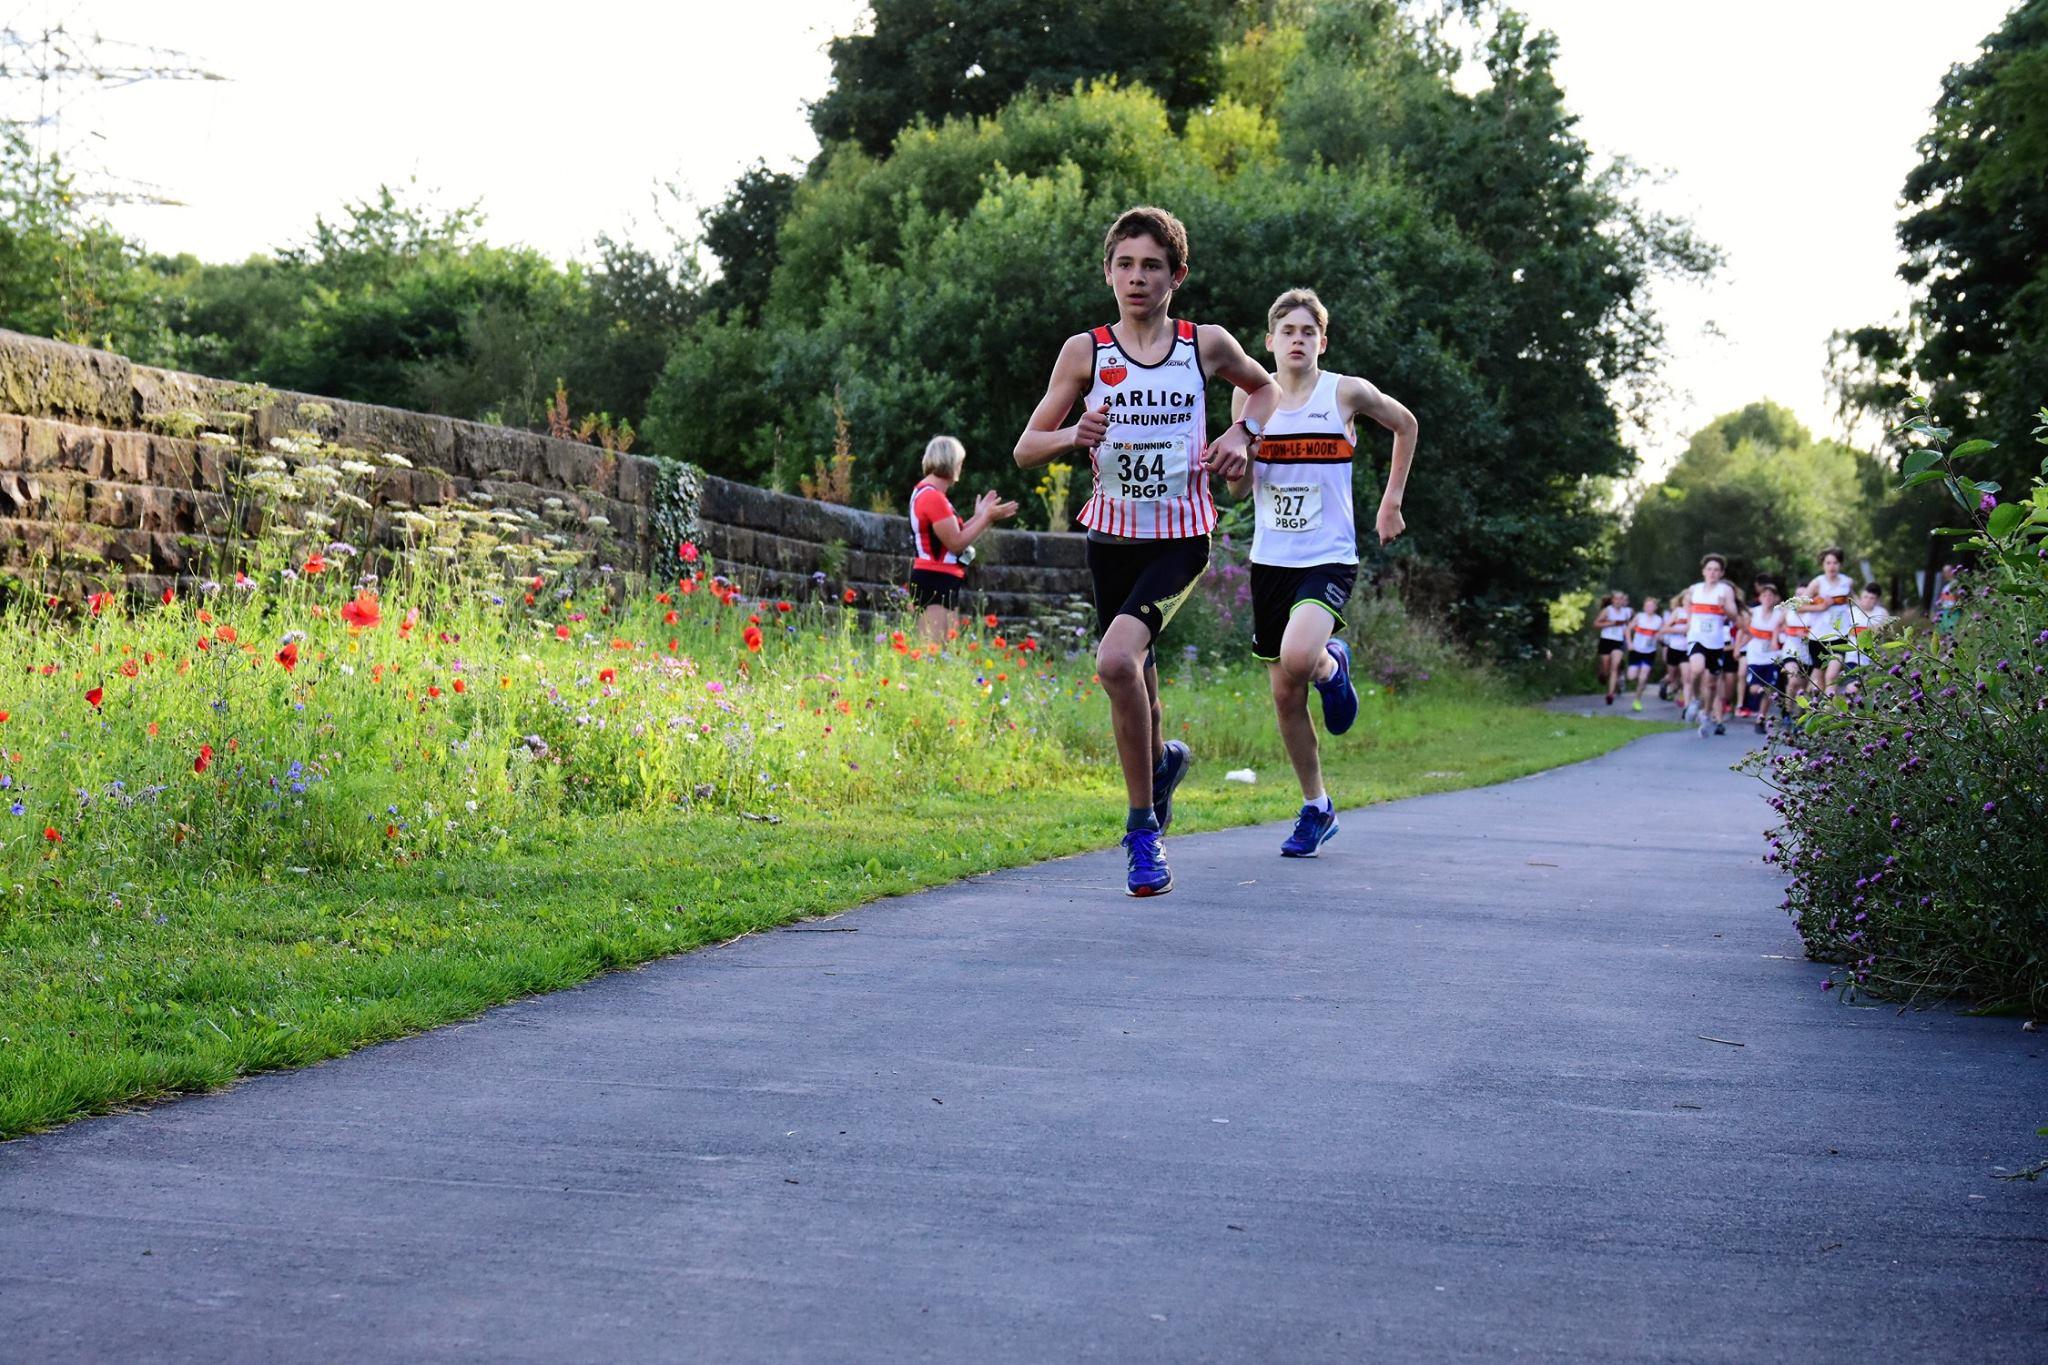 Michael Stevens chased winner Jack Villiers hard in the U15 race. Photo: David Belshaw